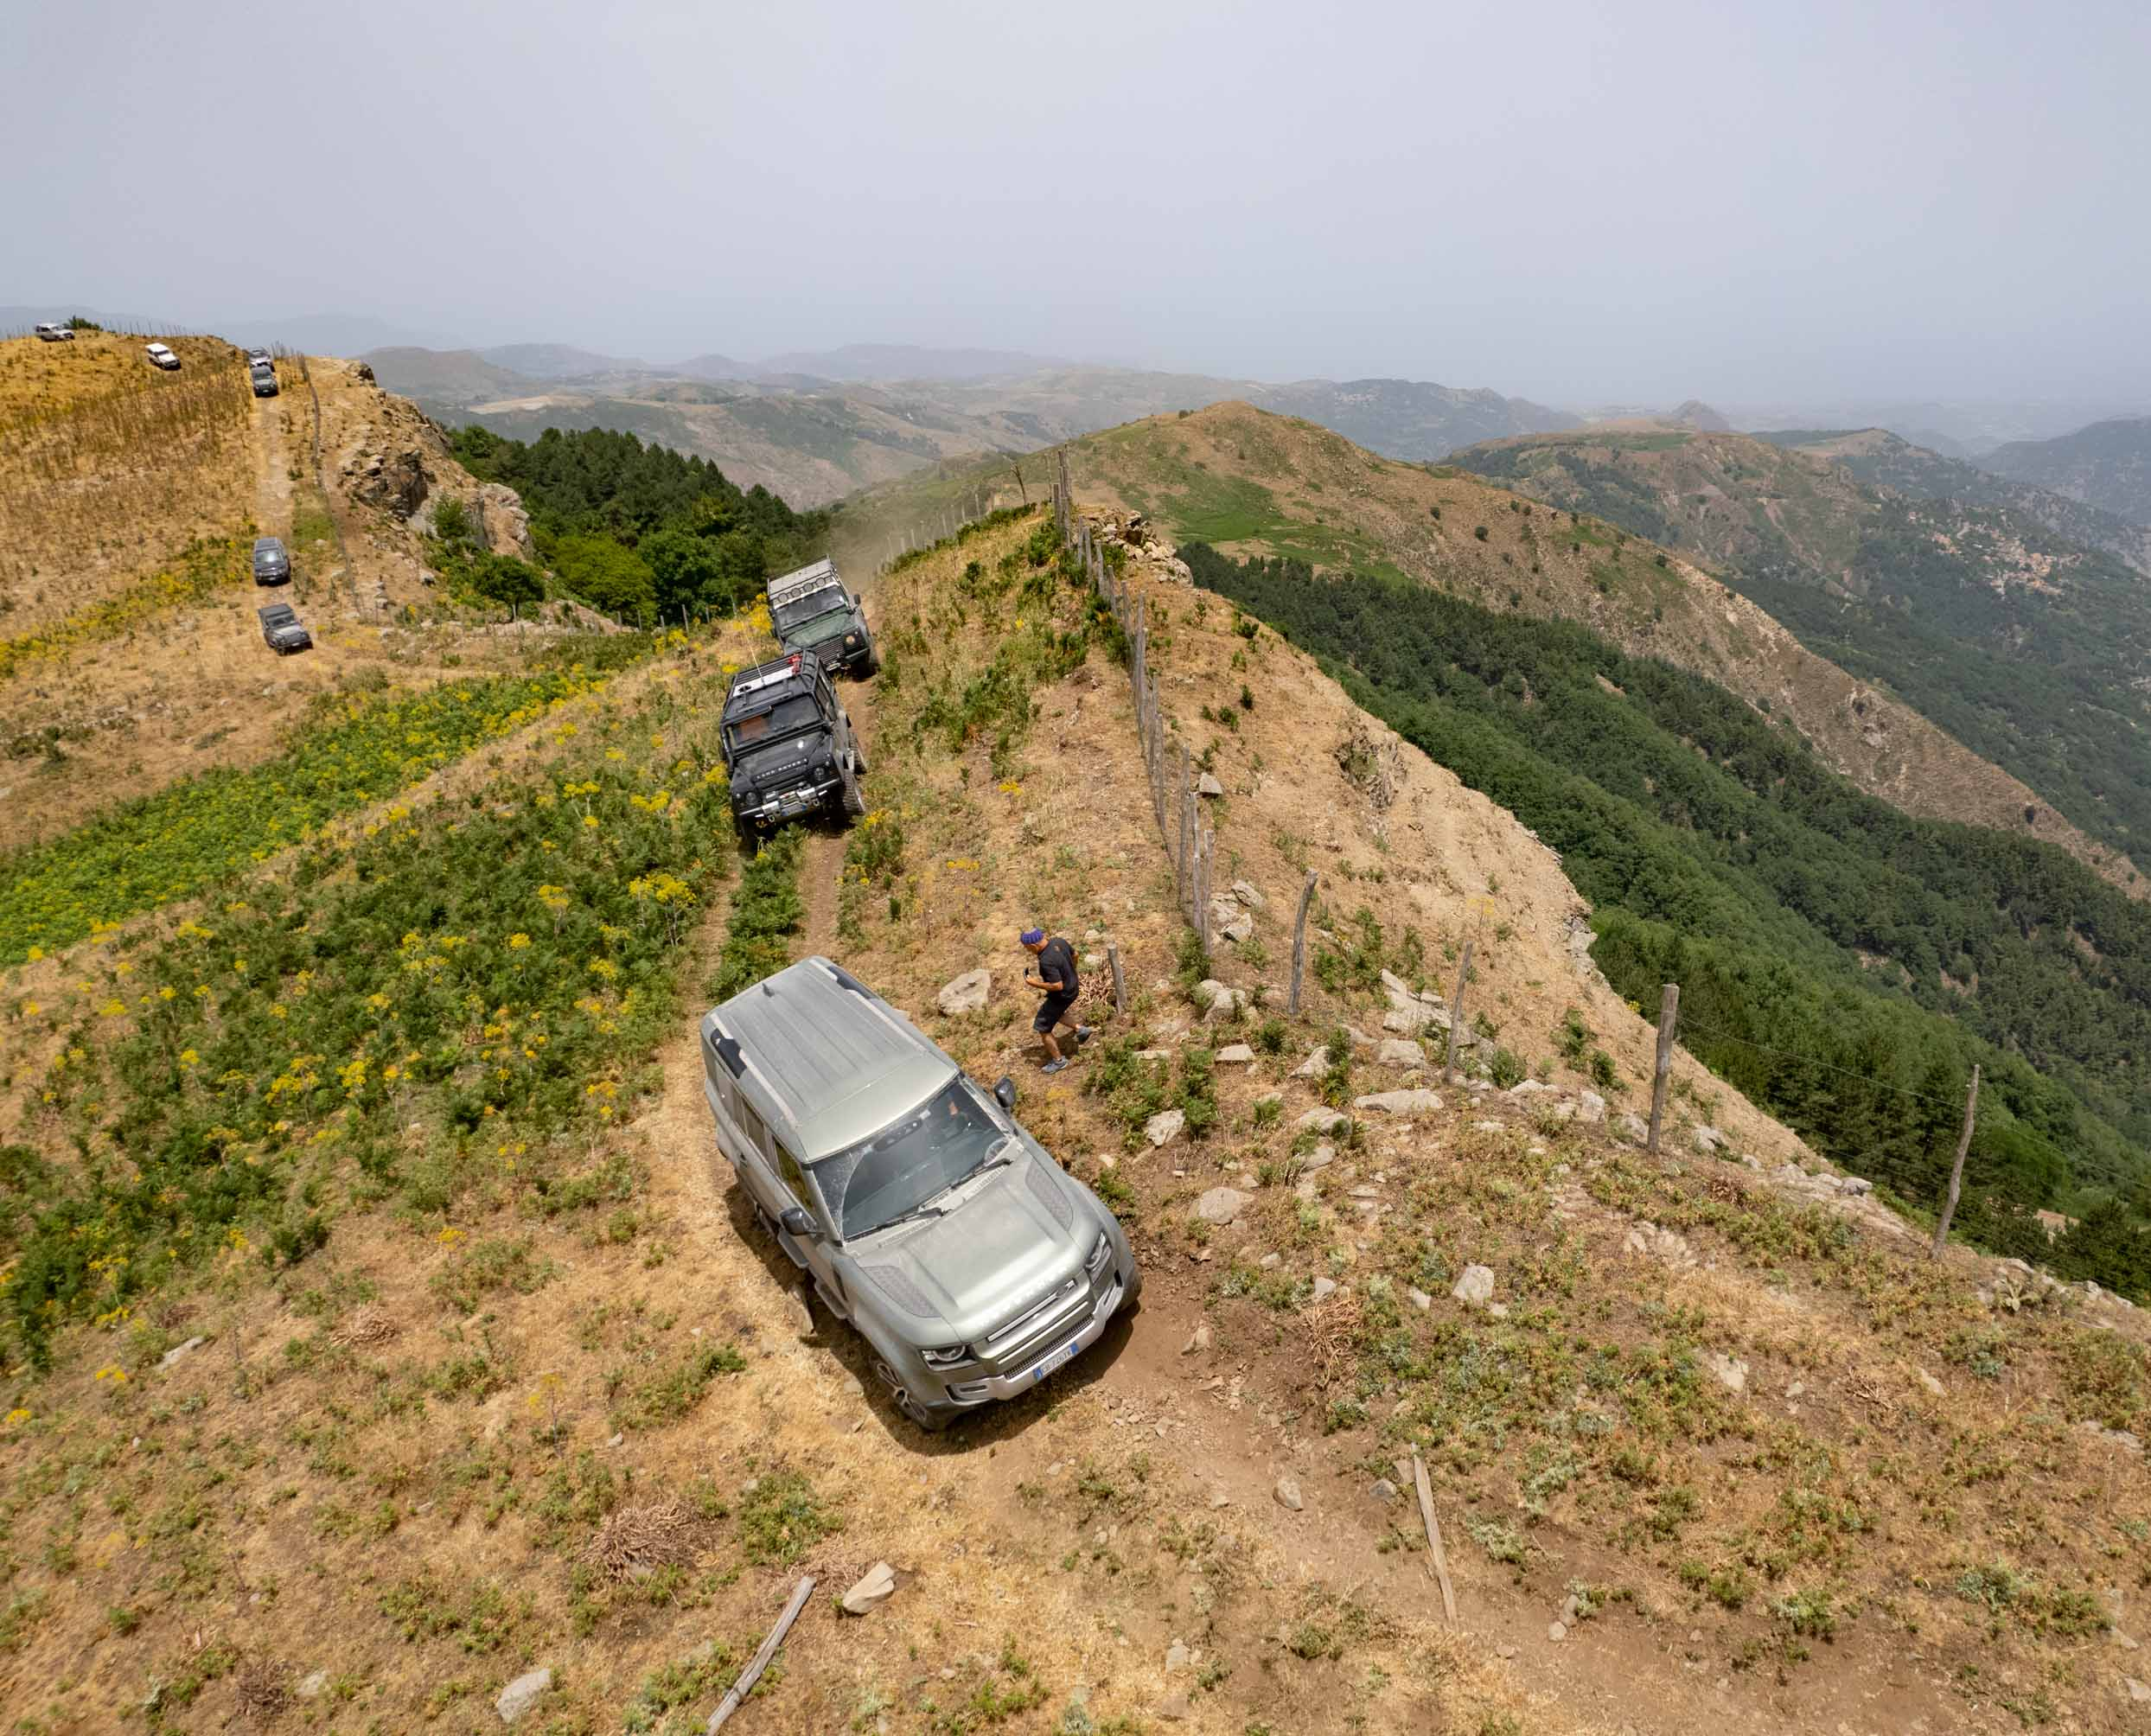 Land_Rover_Tour_Sicilia_2021_Land_Rover_Experience_Italia_-31